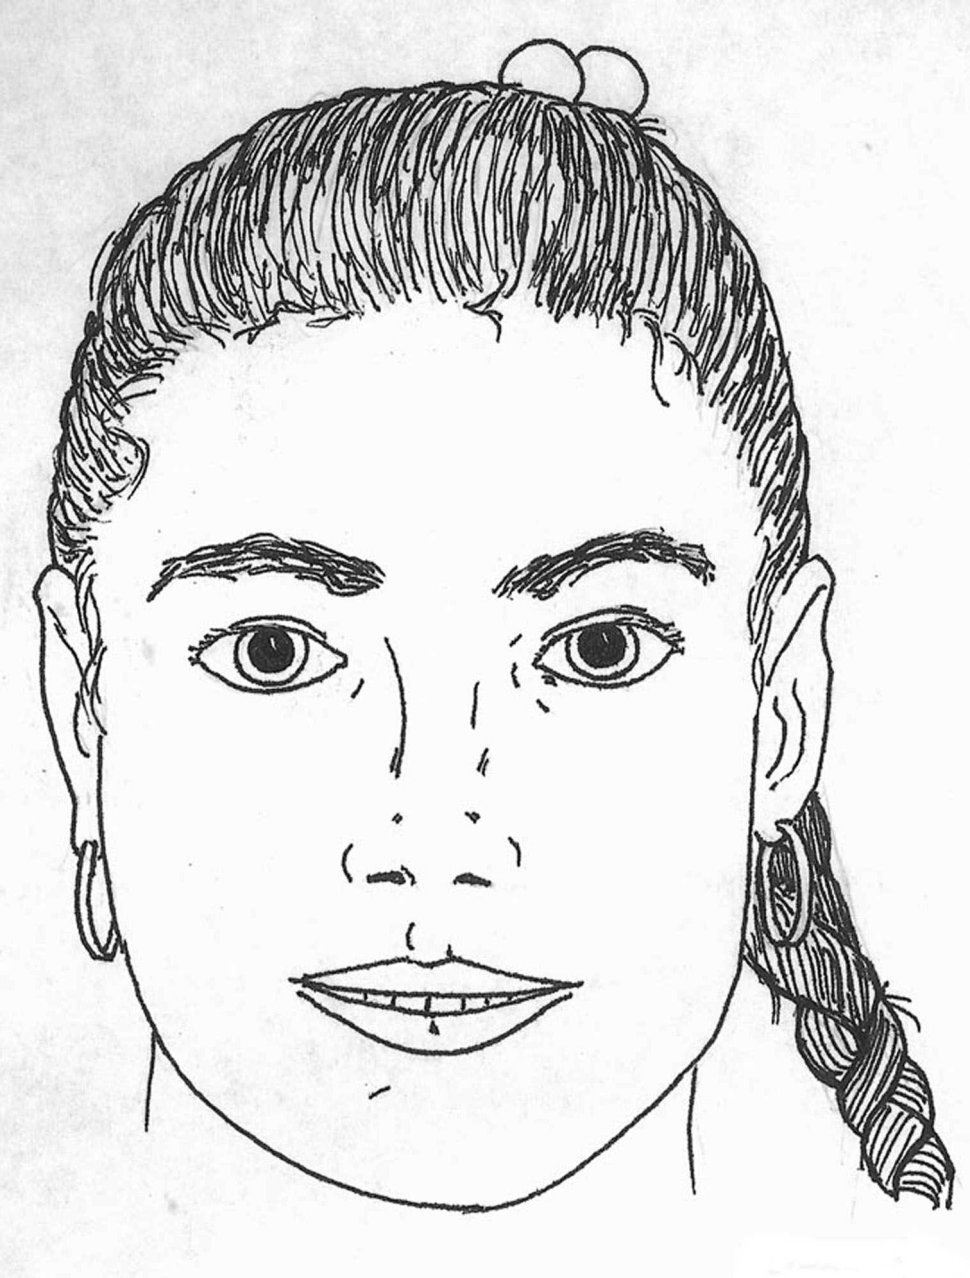 Belice, Belize, Serial Killer, Asesino en serie, Jack el destripador de Belice, Jack the ripper of Belize, niñas asesinadas